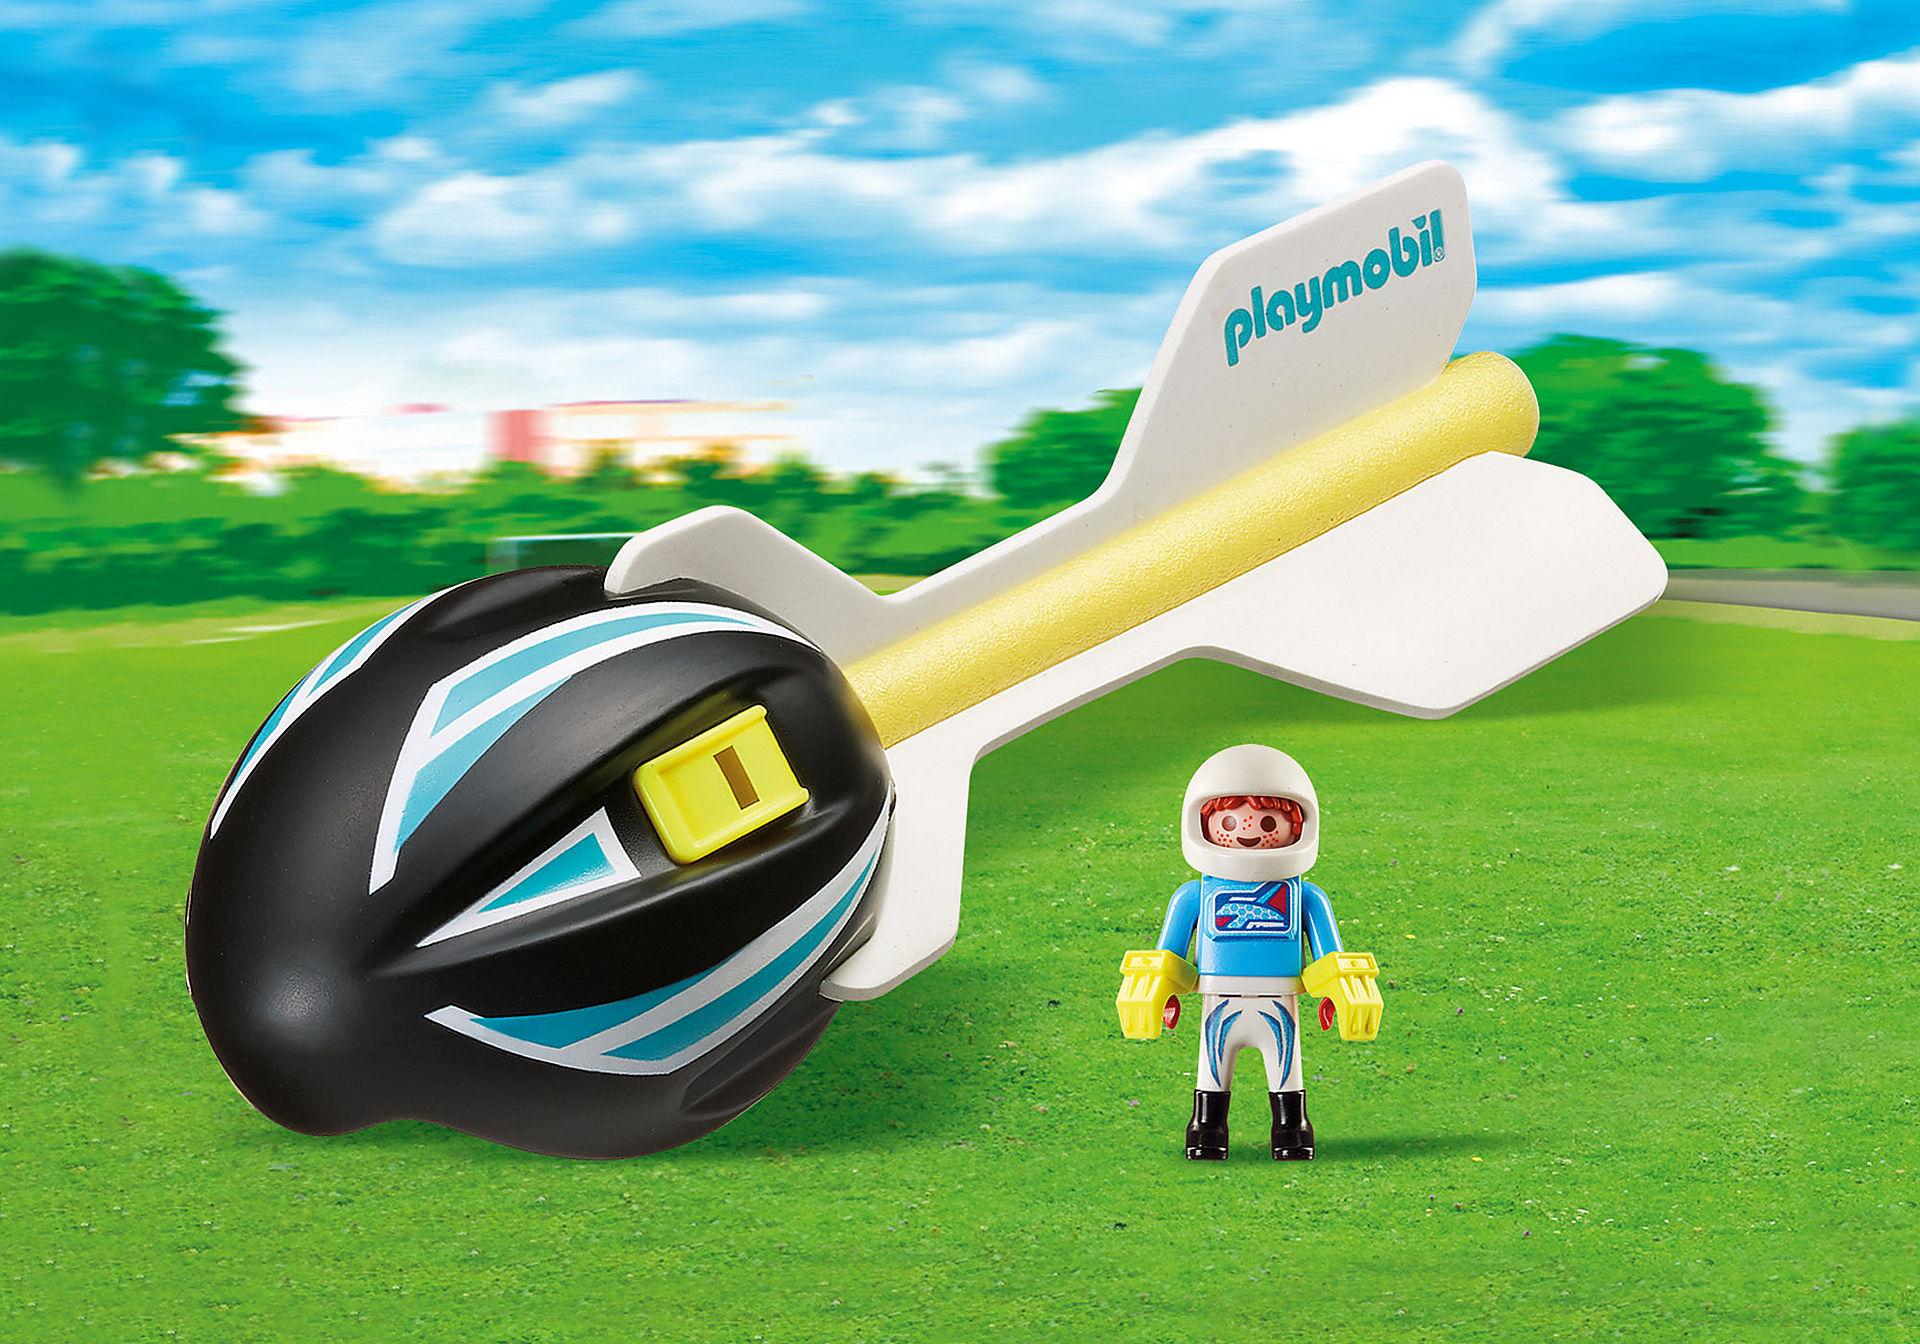 http://media.playmobil.com/i/playmobil/9374_product_extra1/Ιπτάμενη ρουκέτα